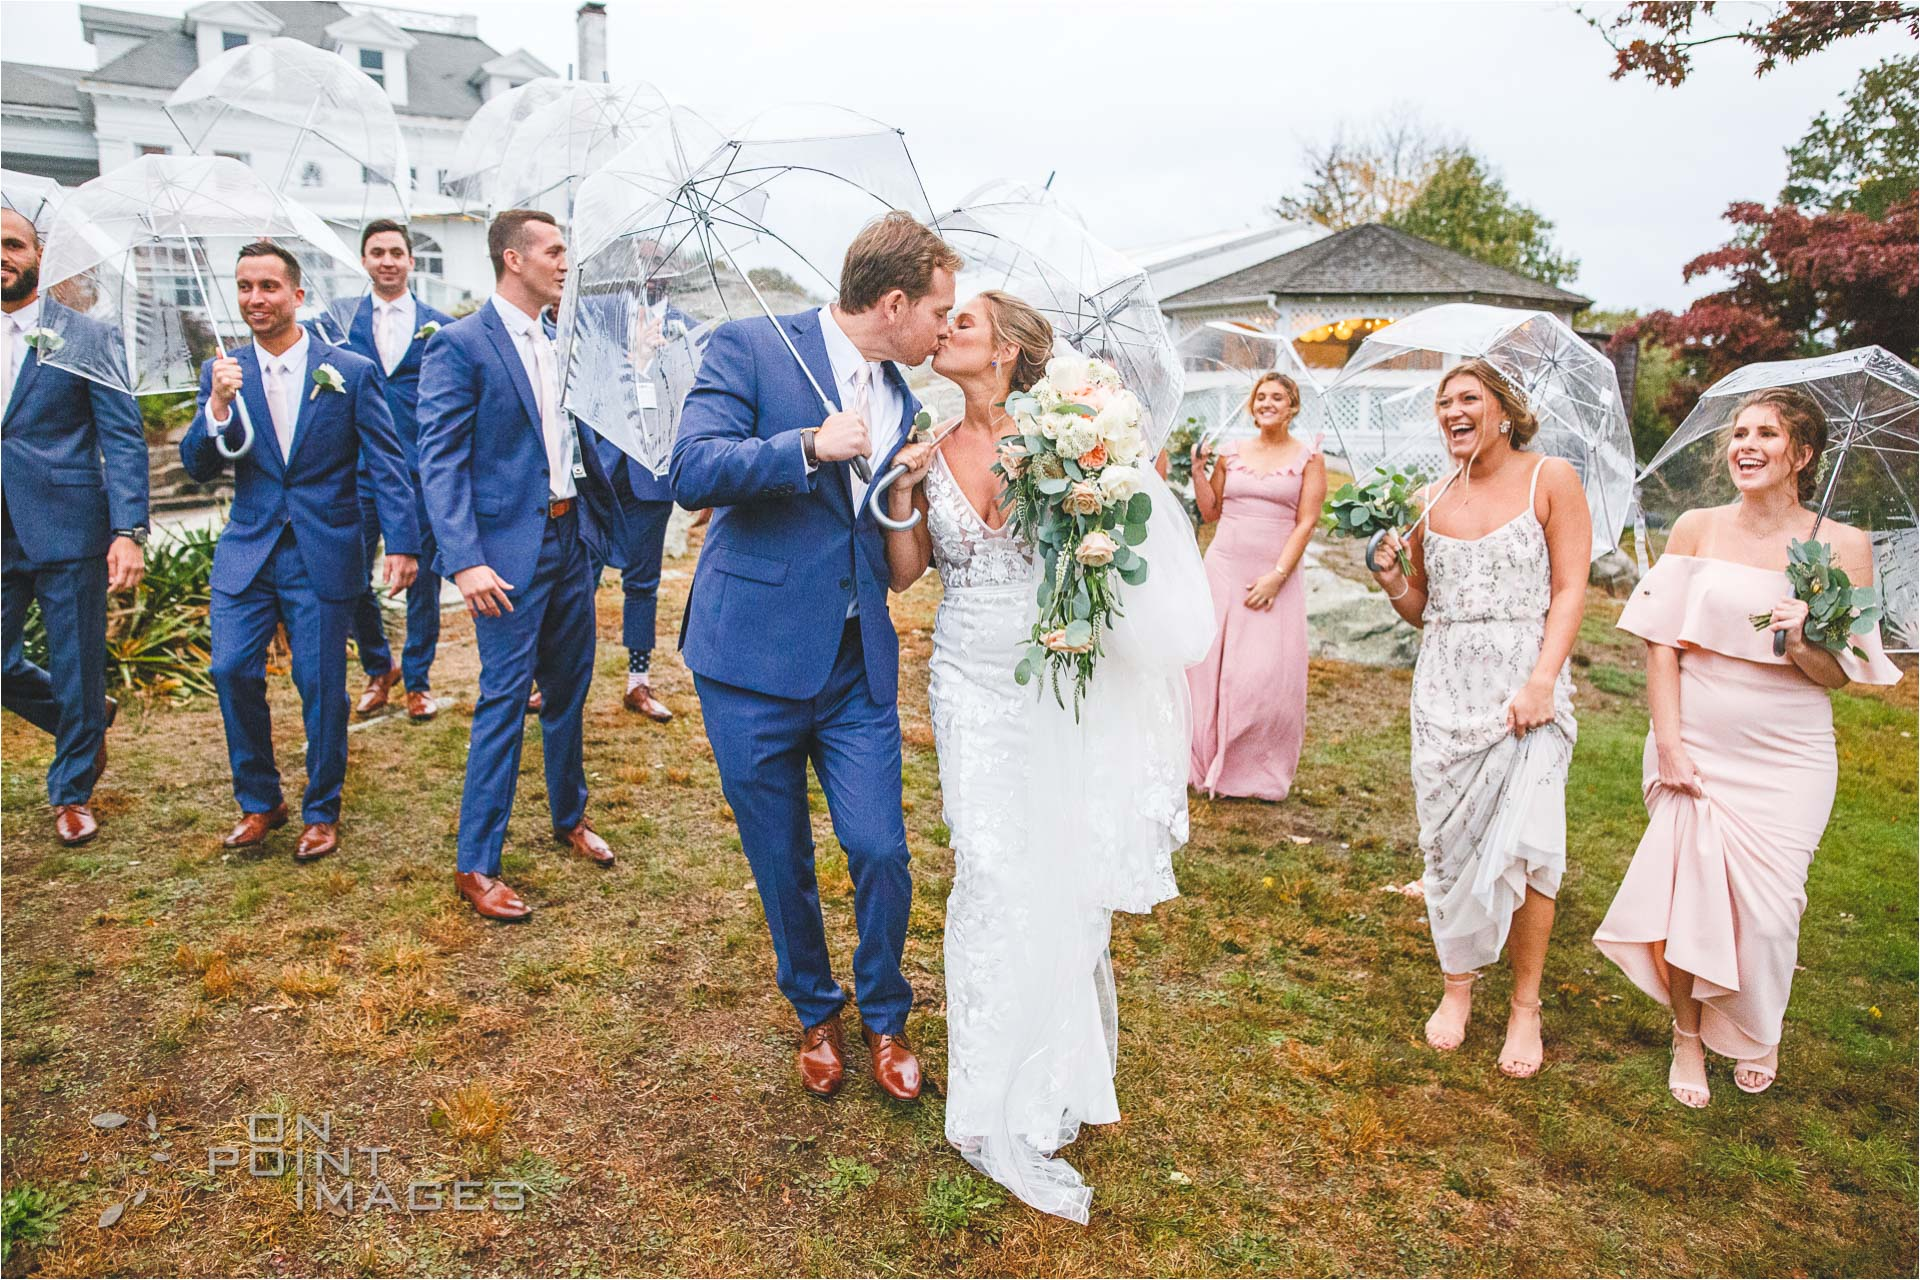 inn-at-mystic-wedding-photography-19.jpg